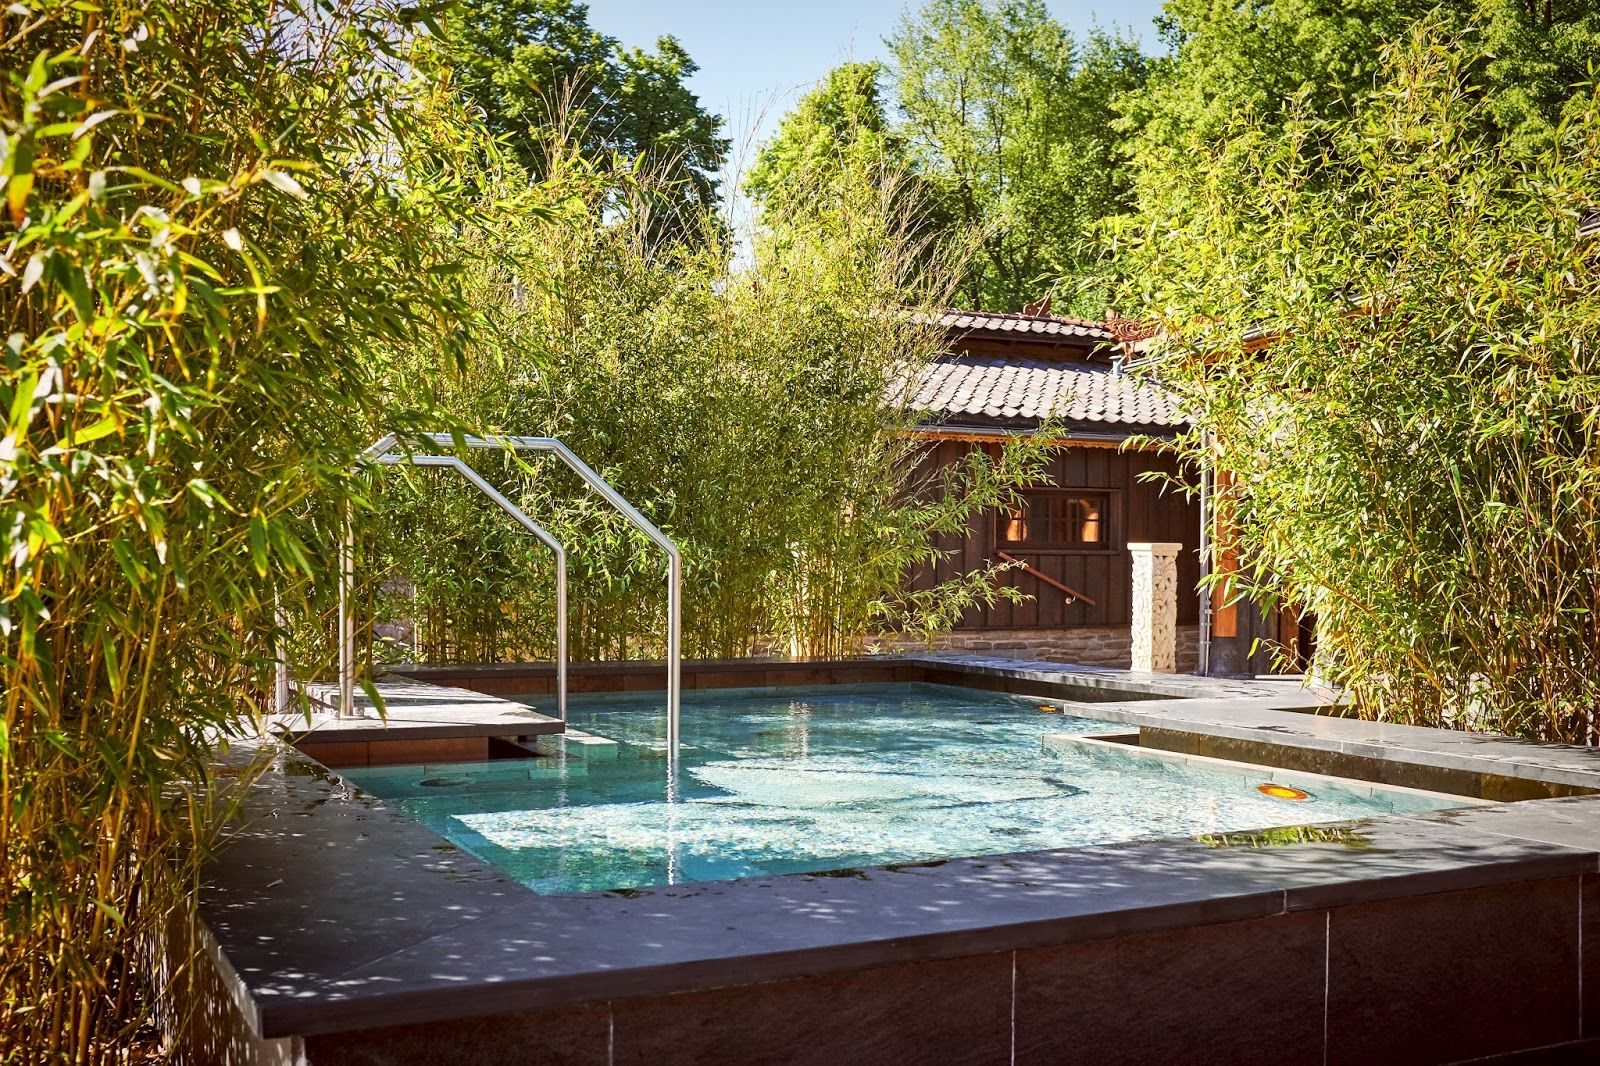 vabali spa eine oase in berlin moabit anneliwest berlin. Black Bedroom Furniture Sets. Home Design Ideas